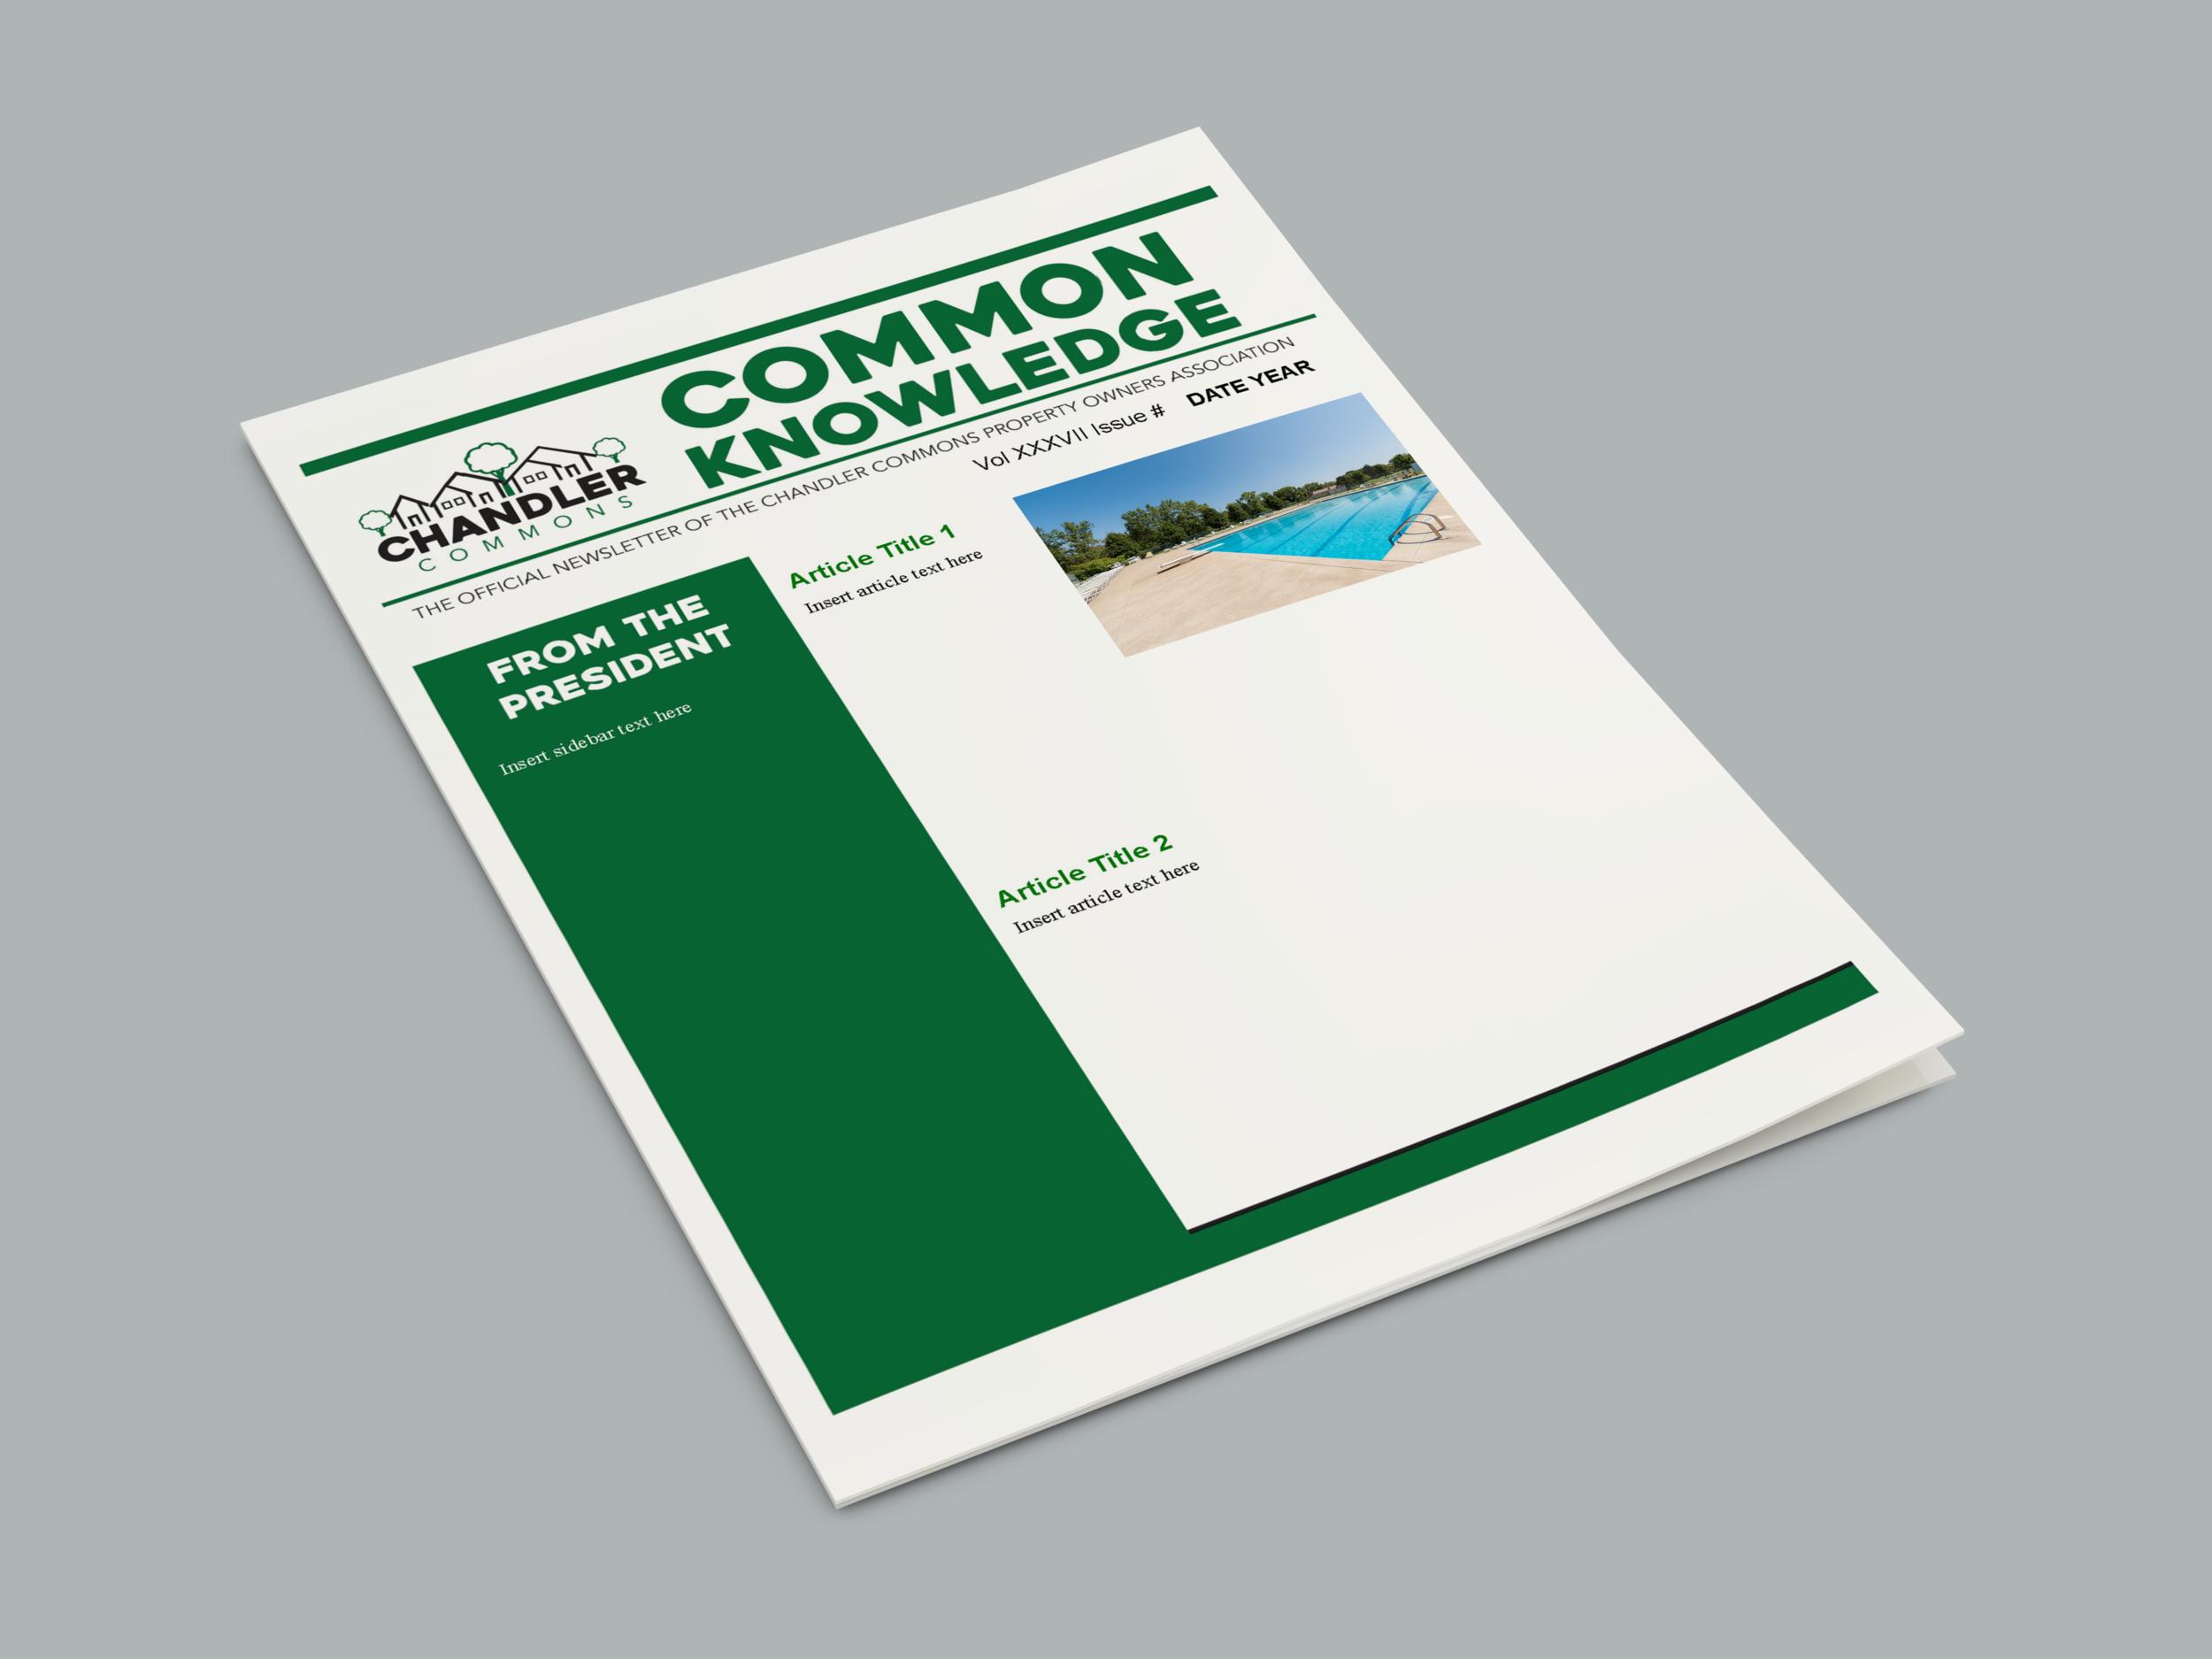 Chandler+Commons+Newsletter+Mockup.png